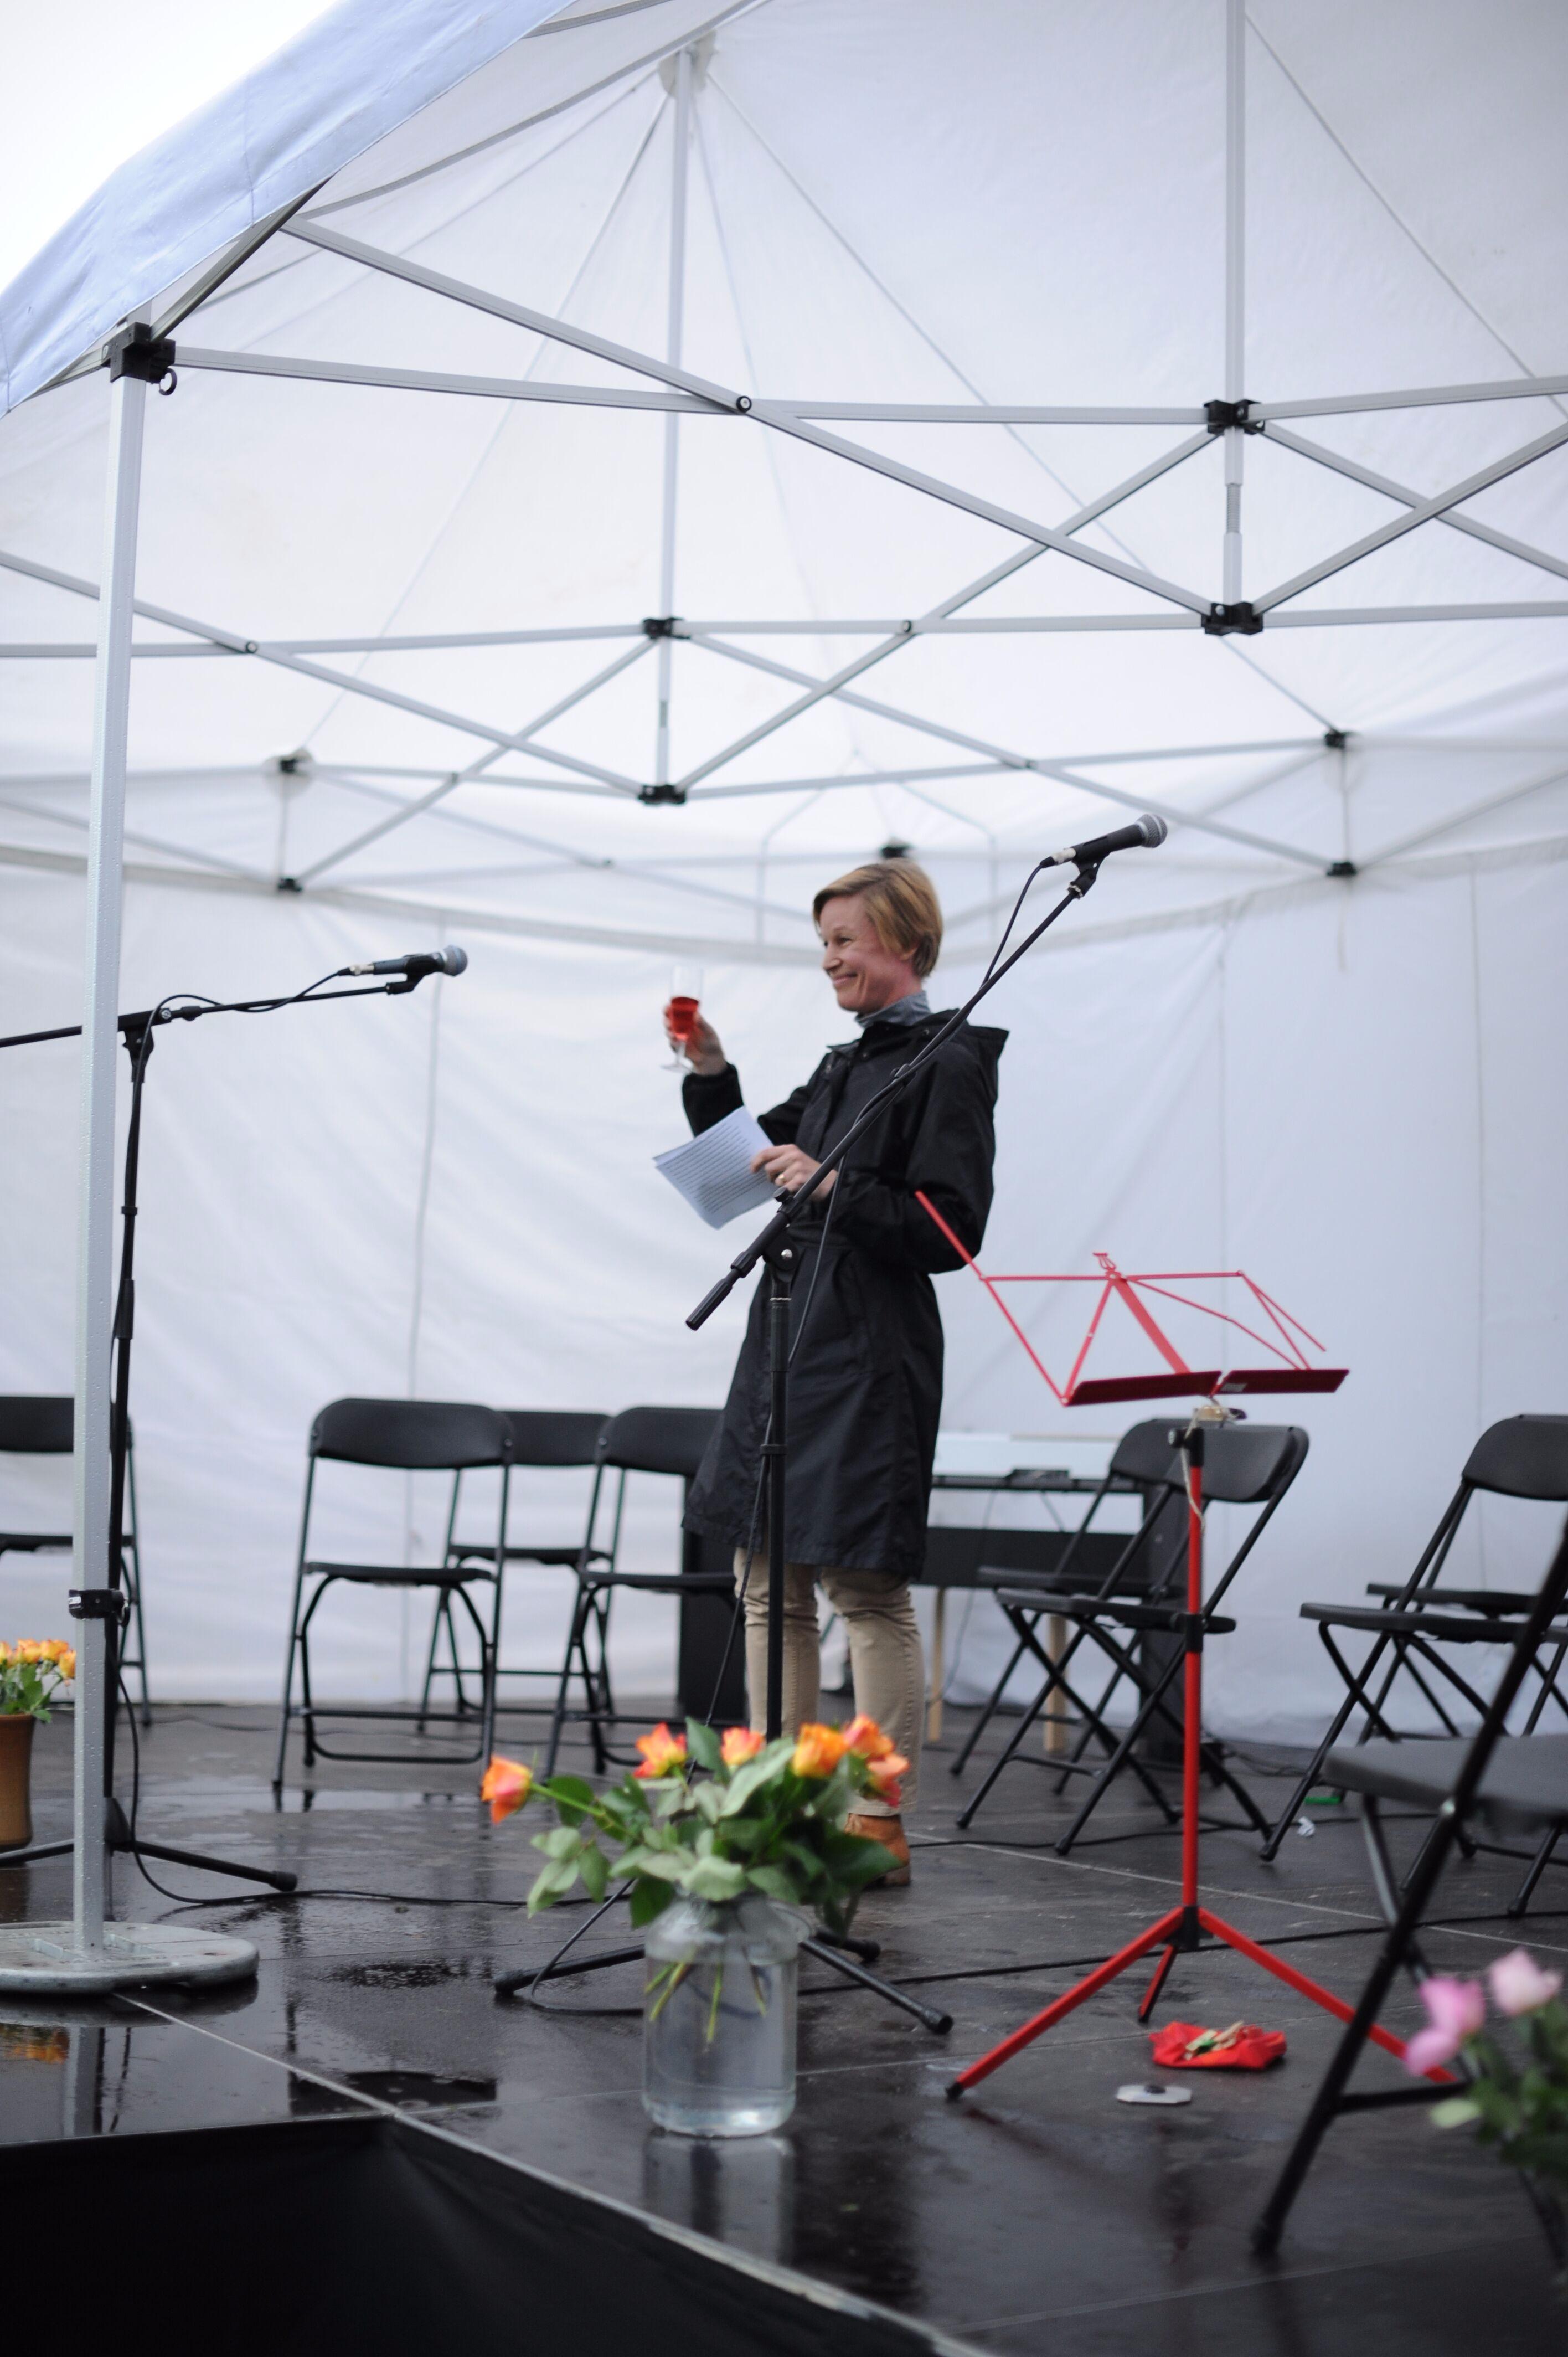 Elina ja malja 100 vuotiaalle Suomelle